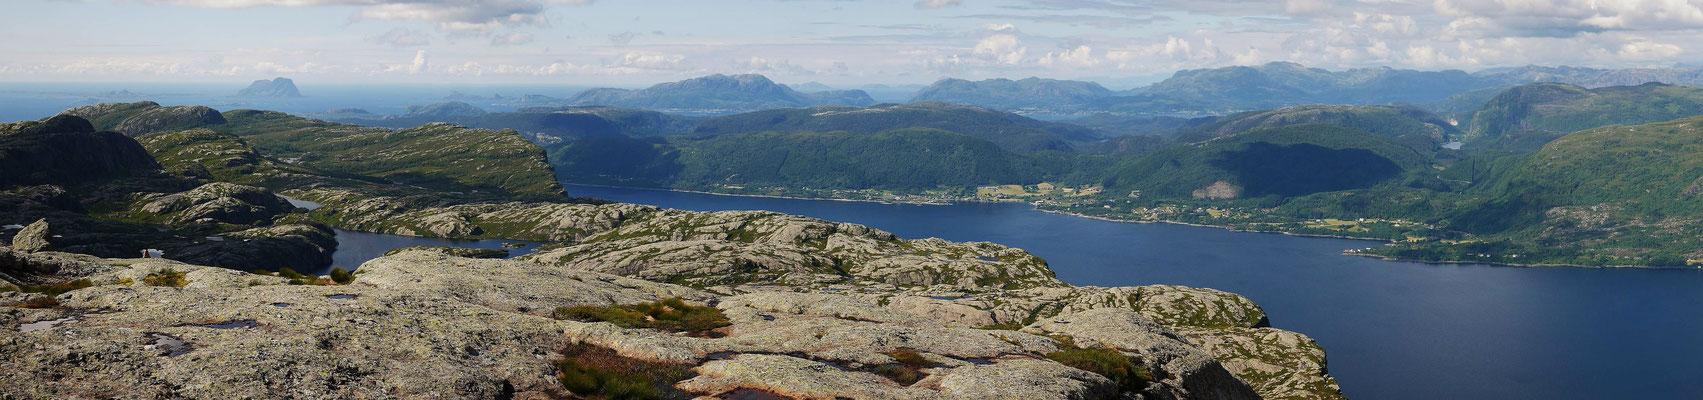 Blick über den Afjord, ganz hinten der Norskehesten auf Alden